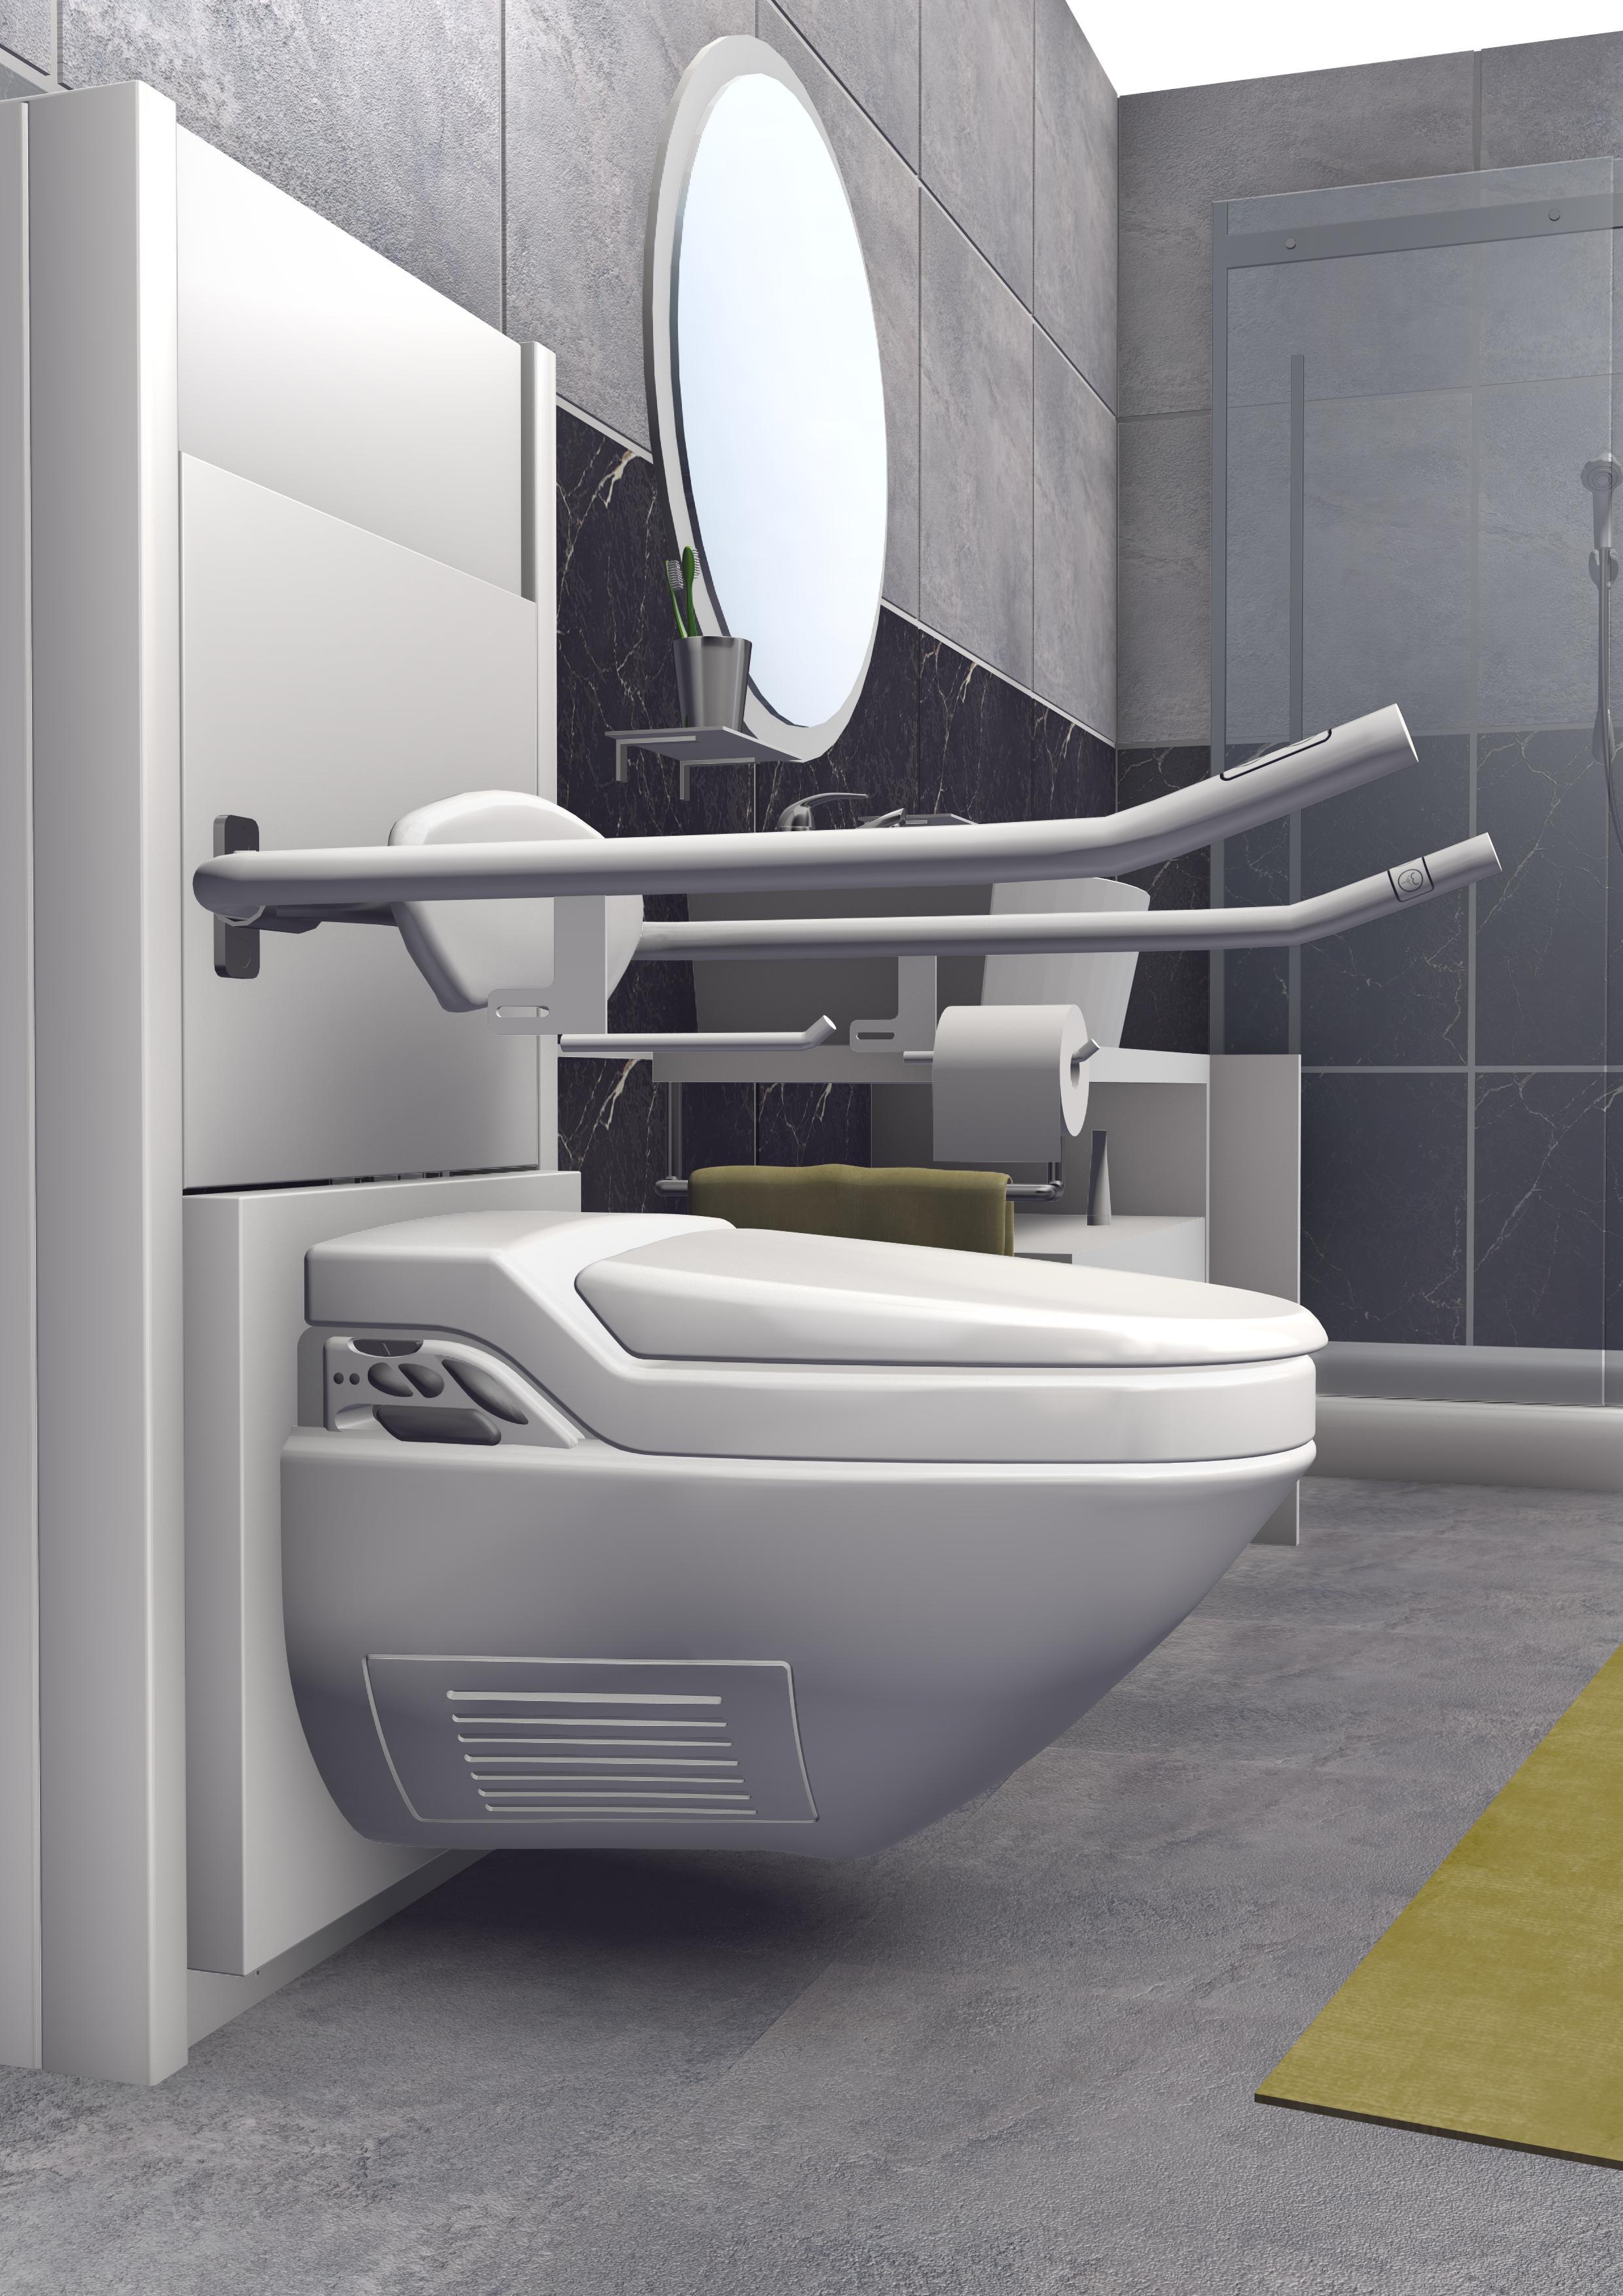 lifttoilette stv100 lift wc seniorengerechte sanit ranlage gl projects. Black Bedroom Furniture Sets. Home Design Ideas